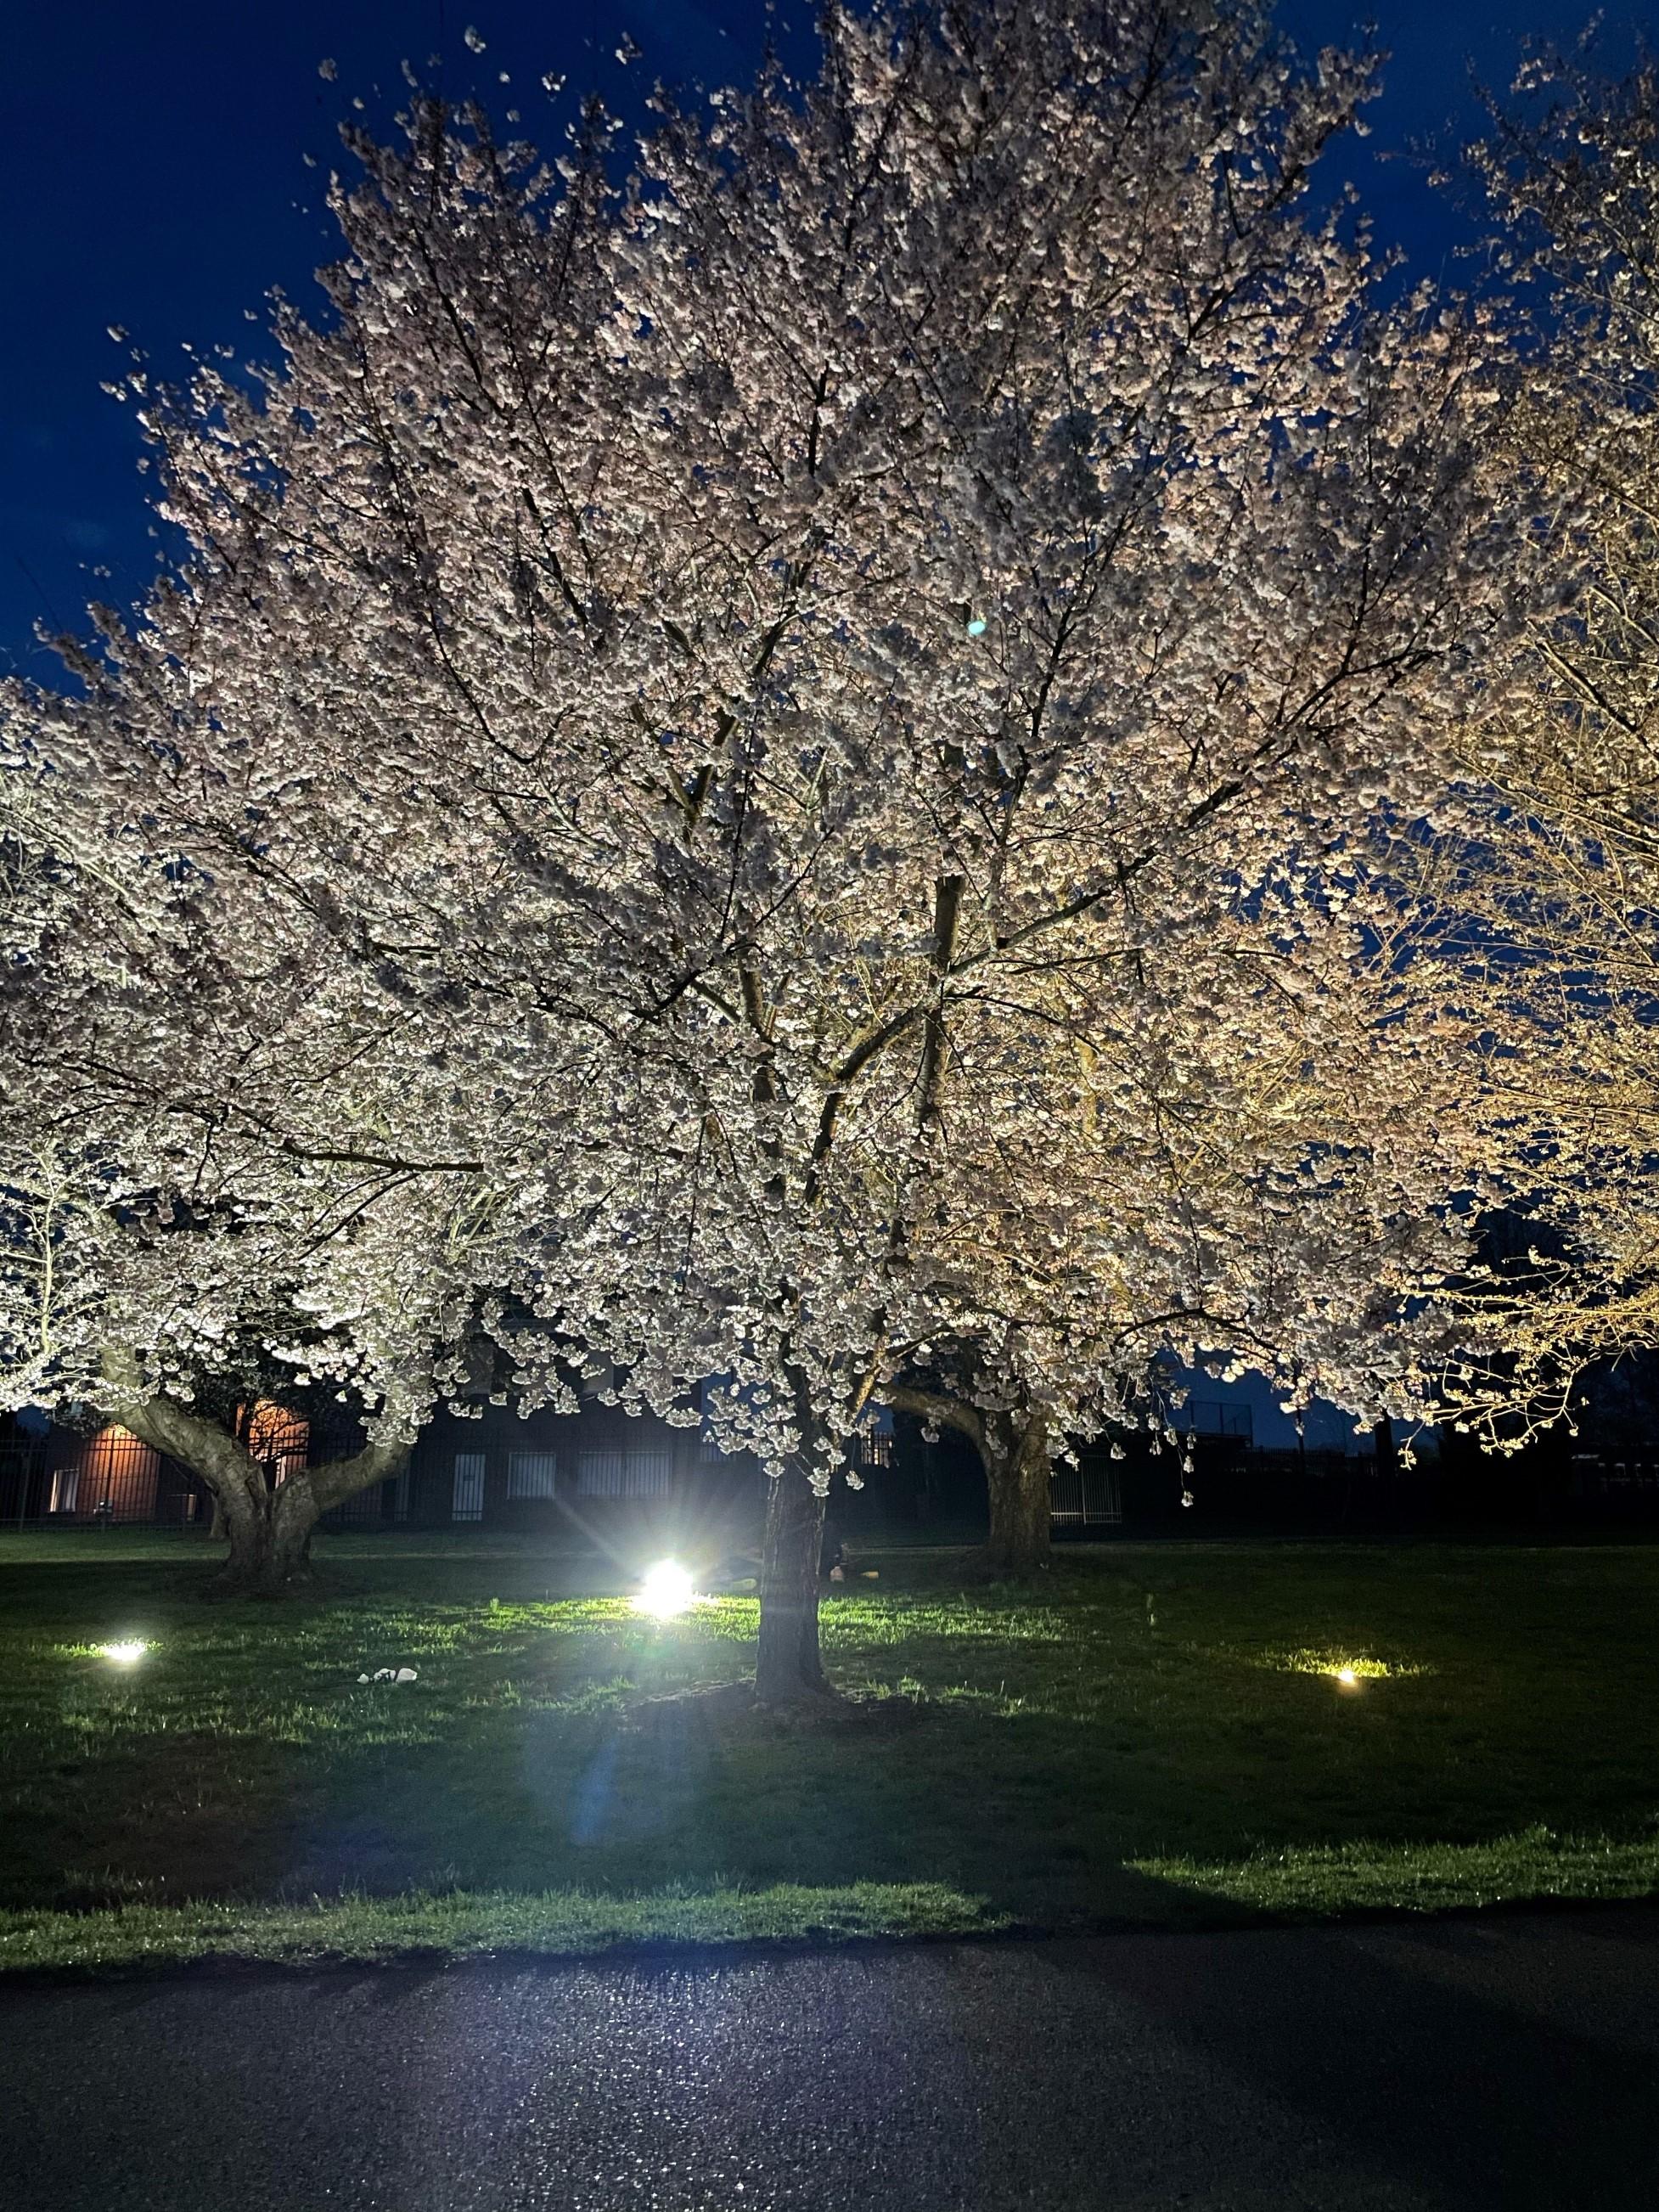 2021_cherryblossoms_0330_KM night (2.2)